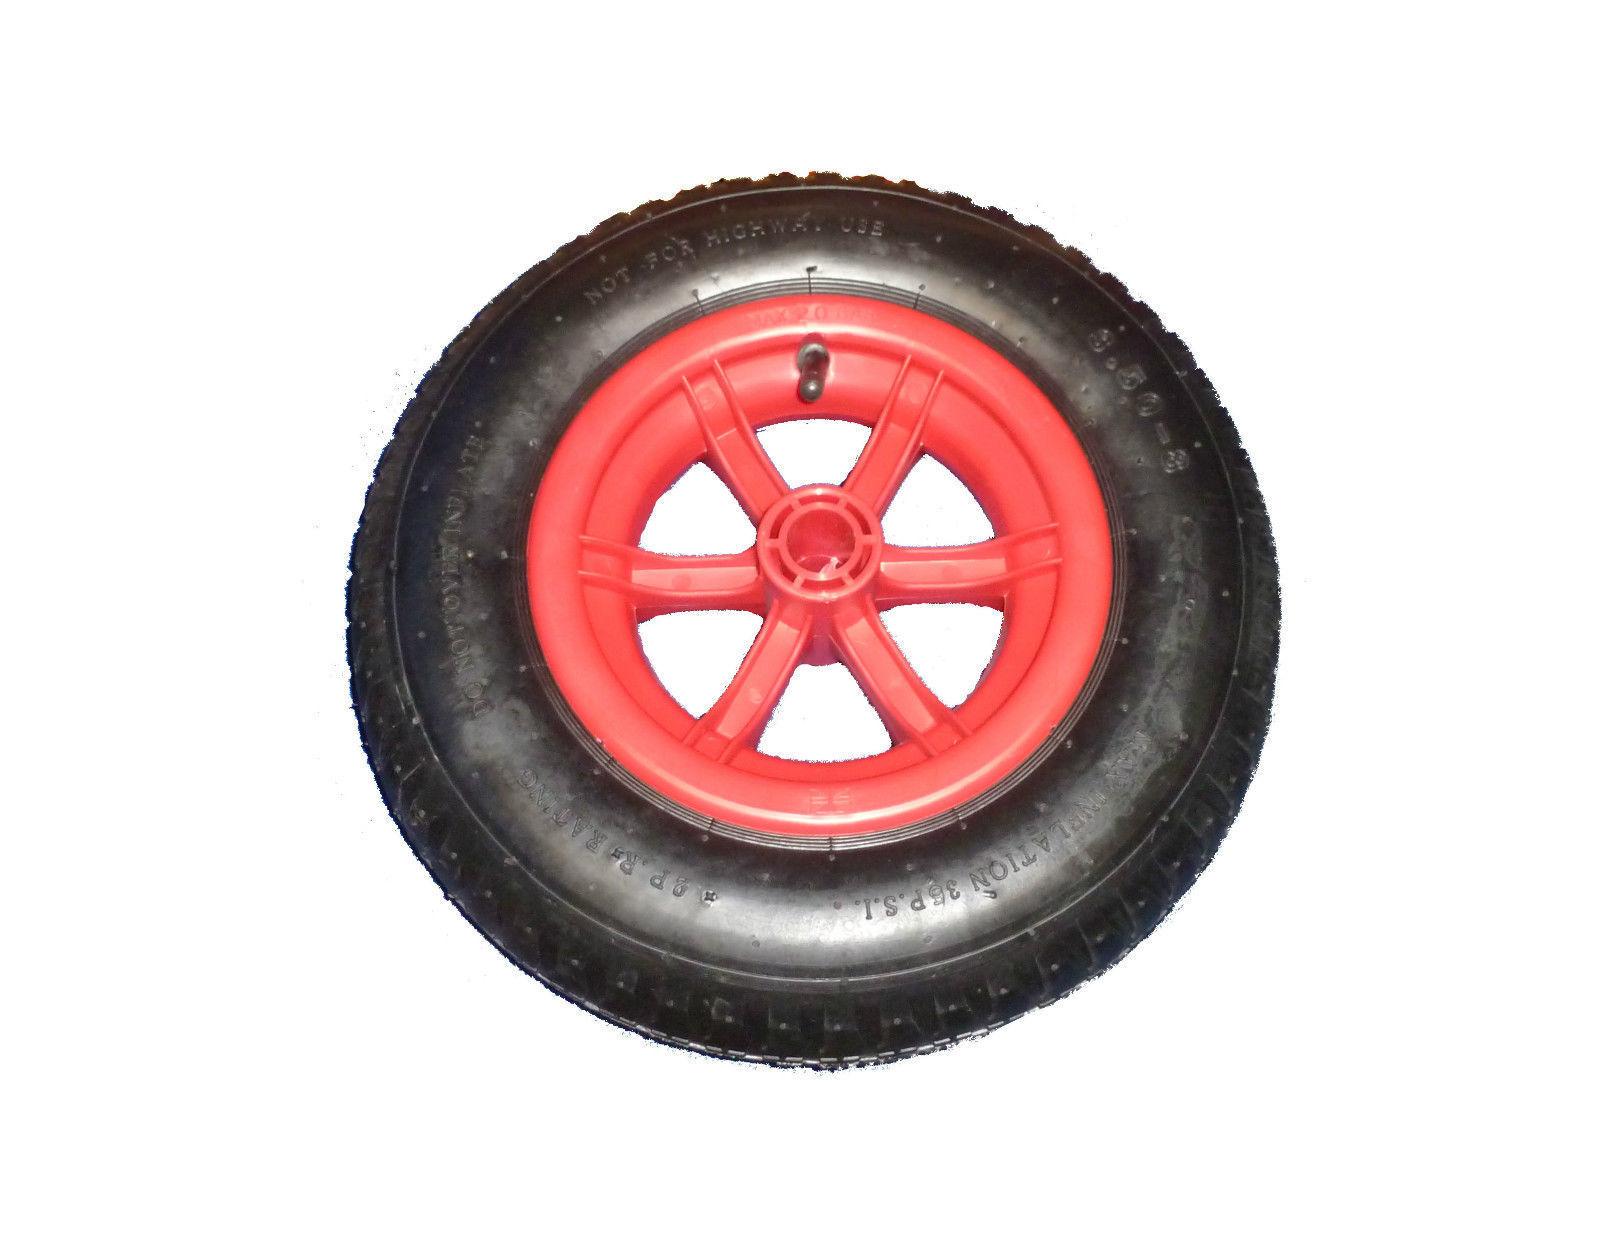 jeweils einem Sackkarrenrad mit Metall-Felge mit Kugellager in der Felge HKB /® 2x Lenkrolle /… 2x Bockrolle 260 mm x 85 mm incl